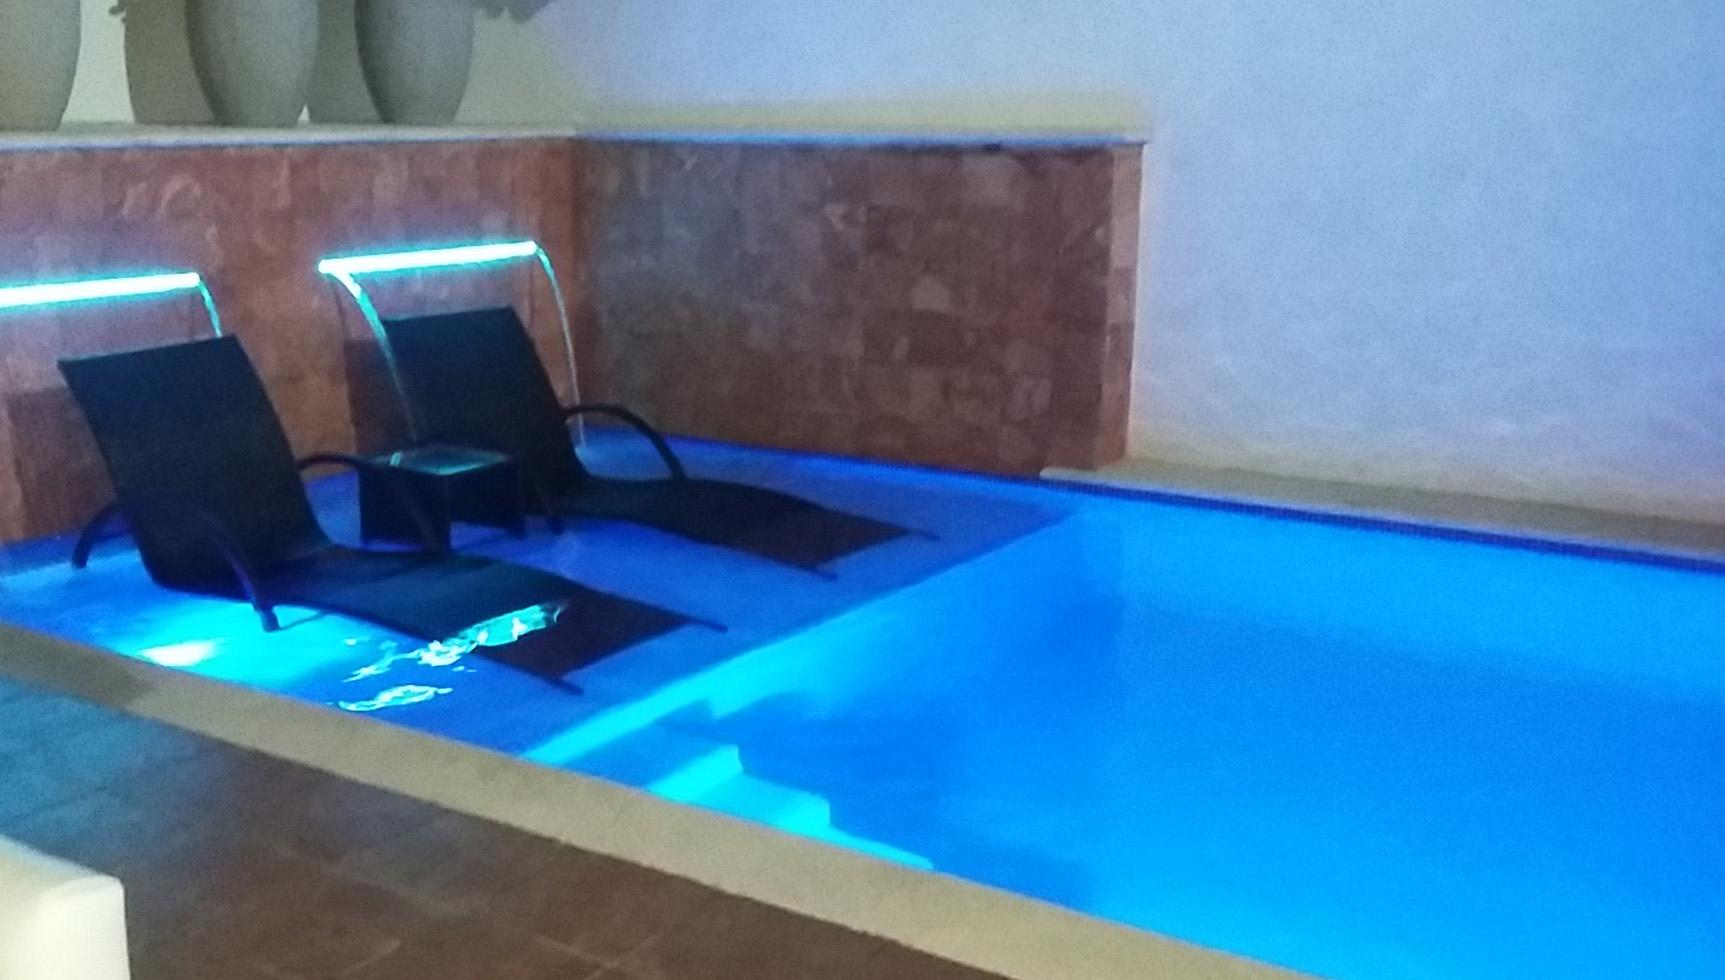 Swimming pool for studios at night